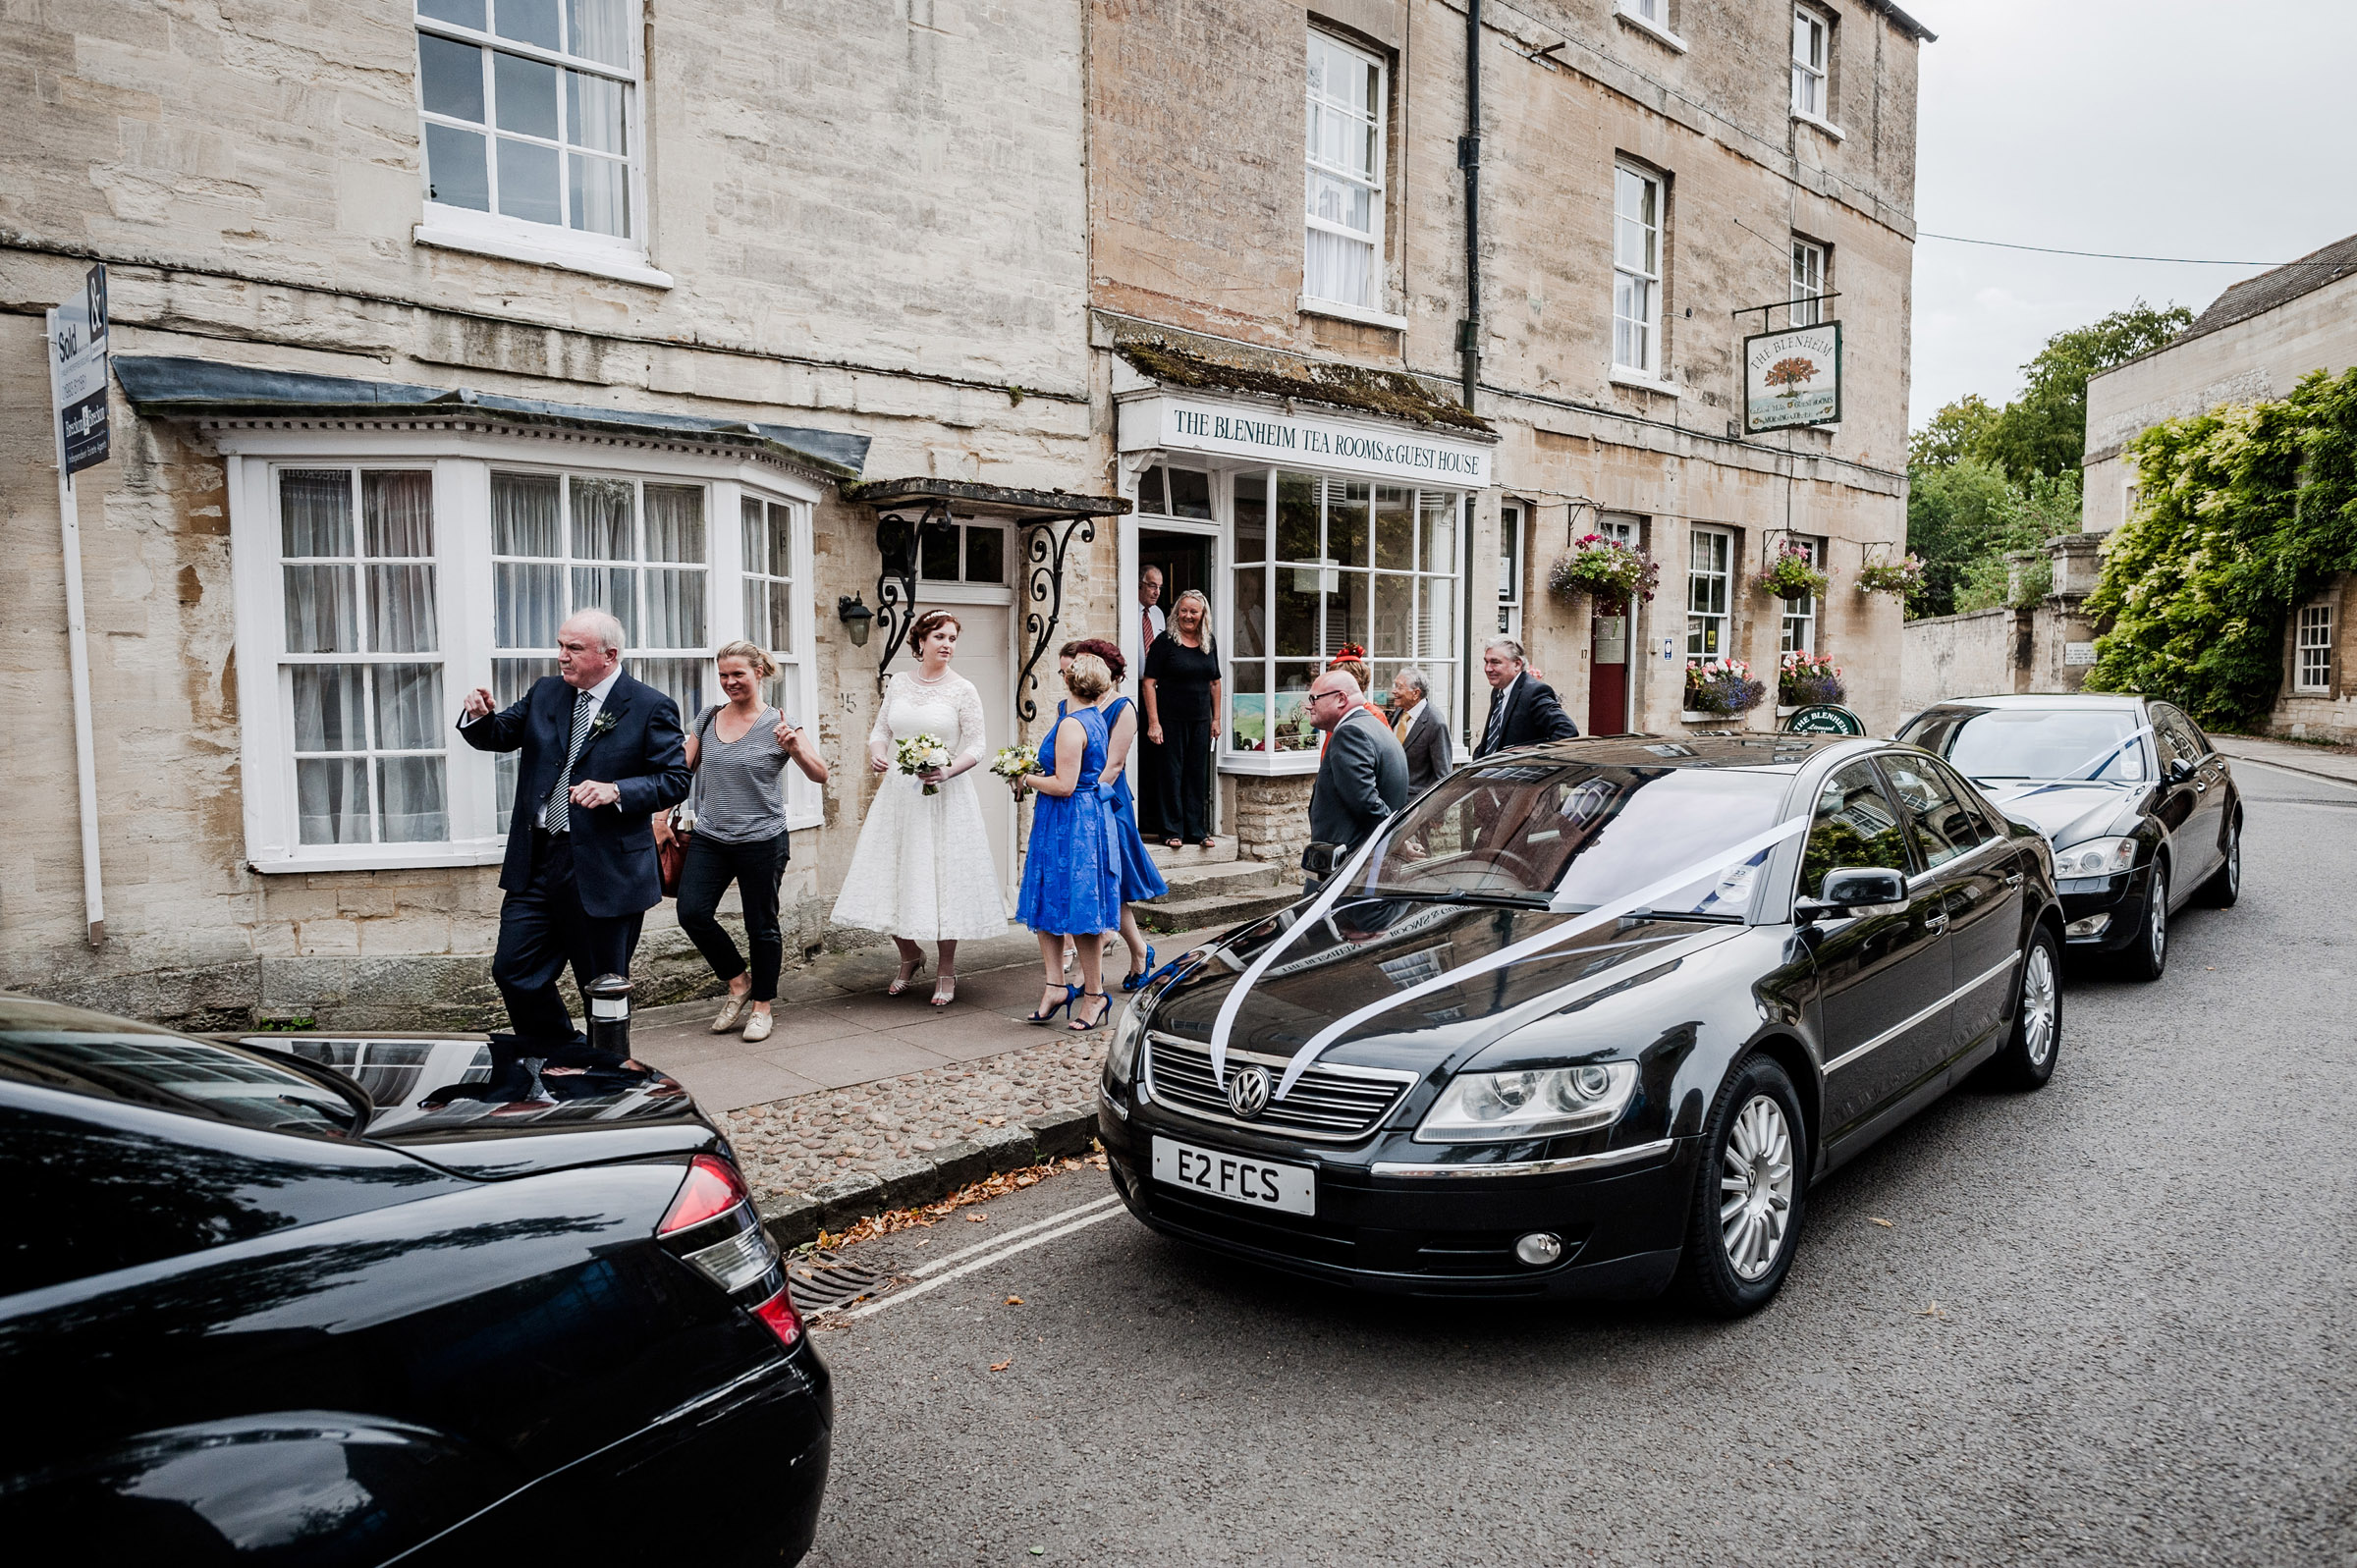 Ashmolean-Museum-Wedding-Pictures-0019.jpg